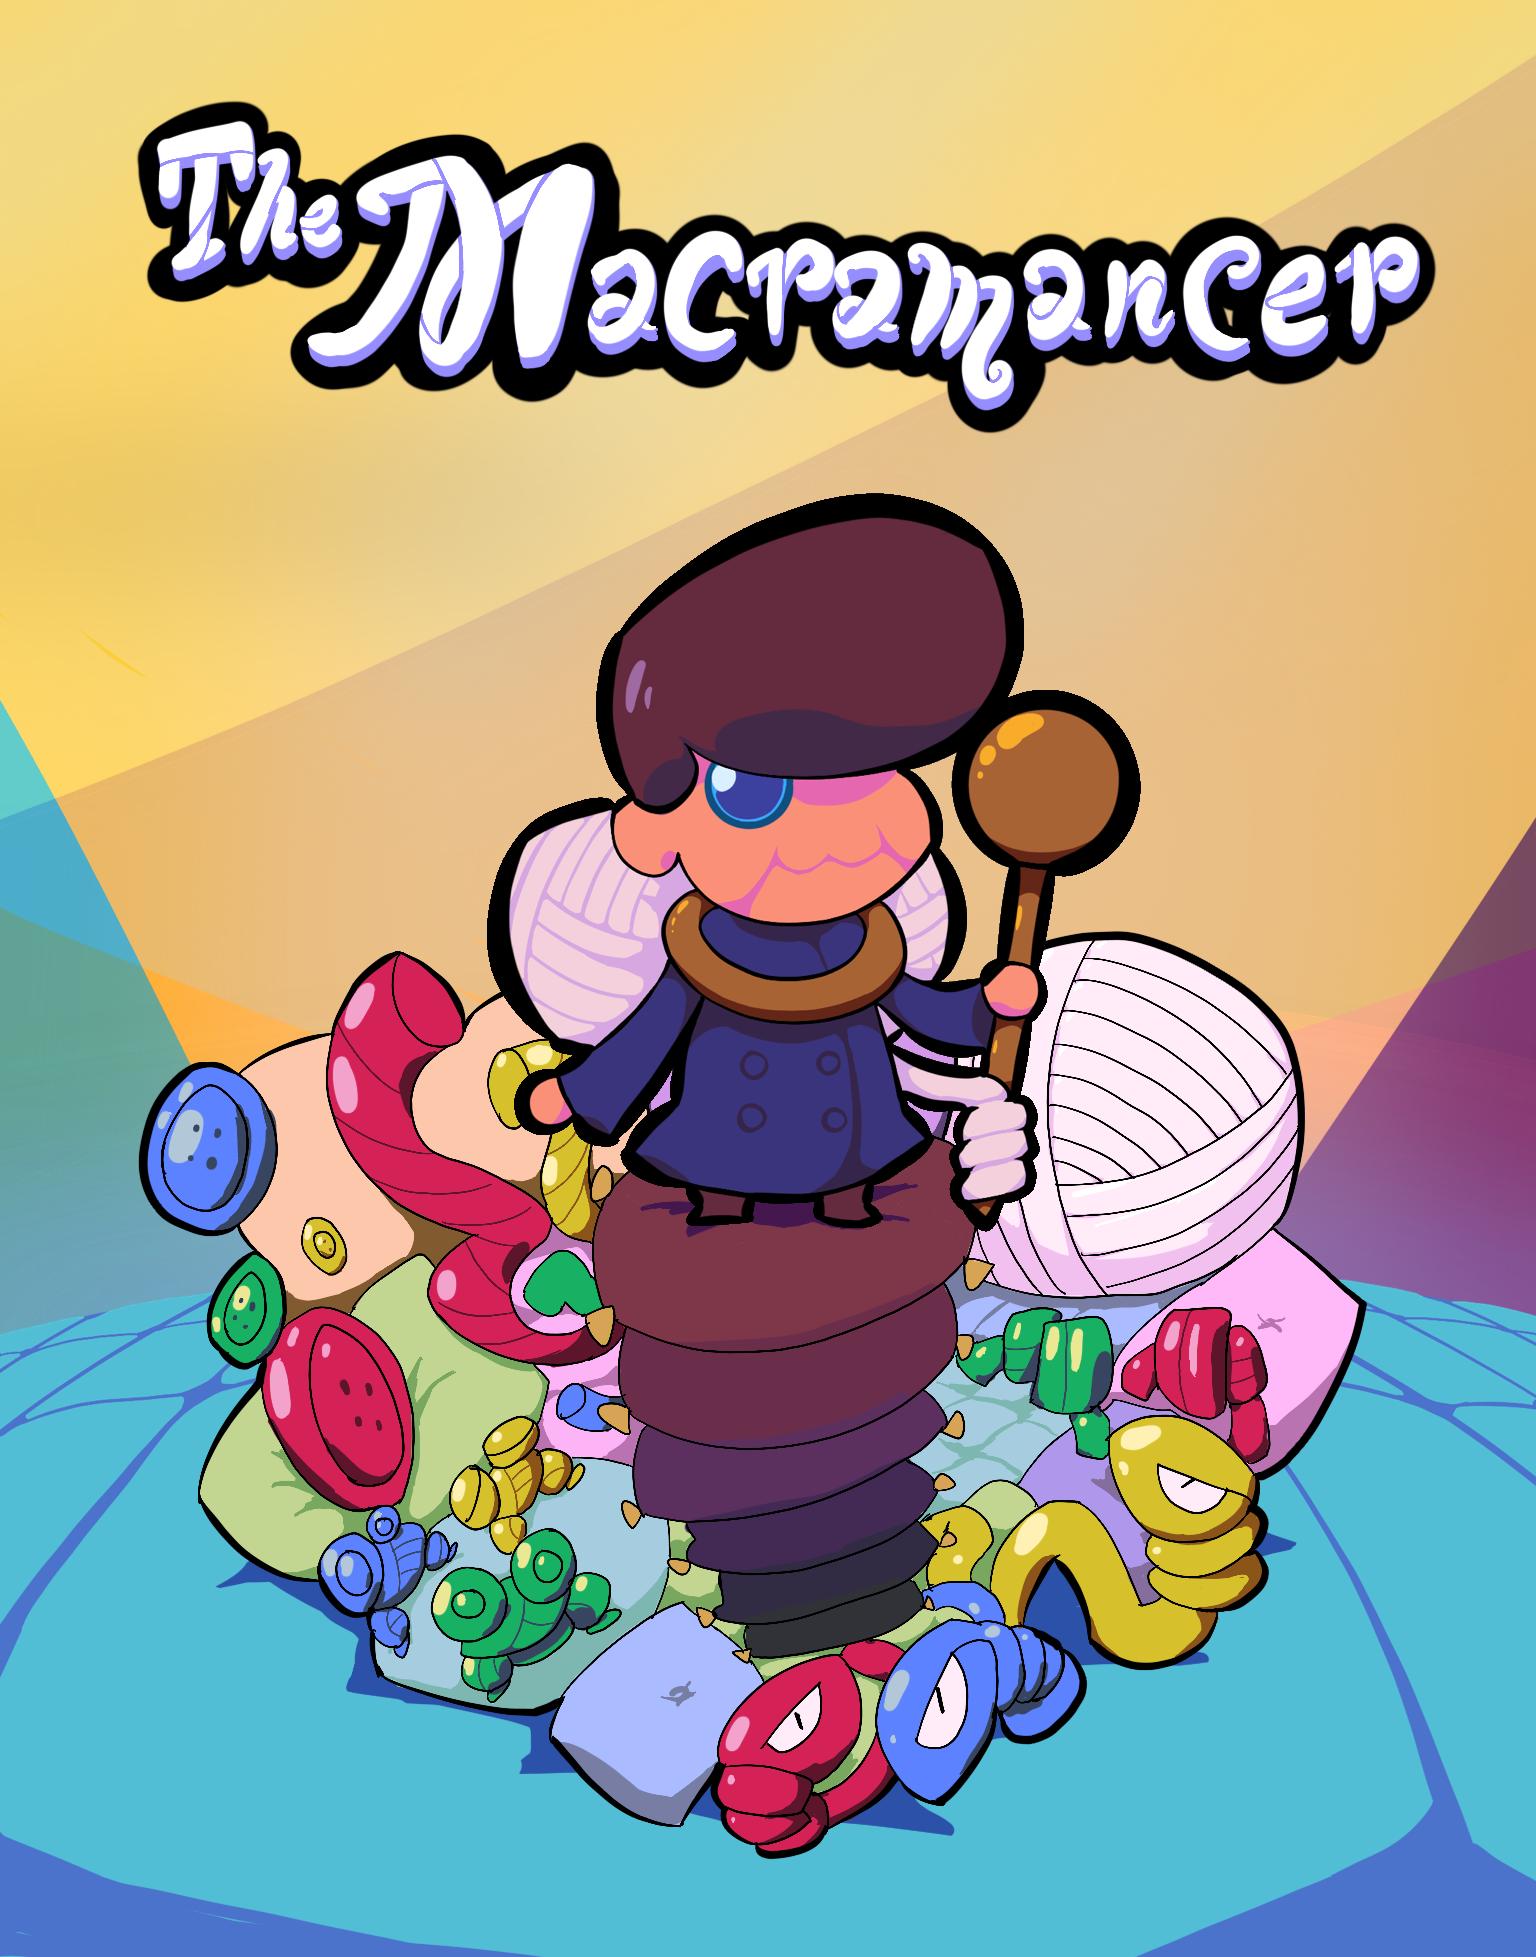 The Macramancer